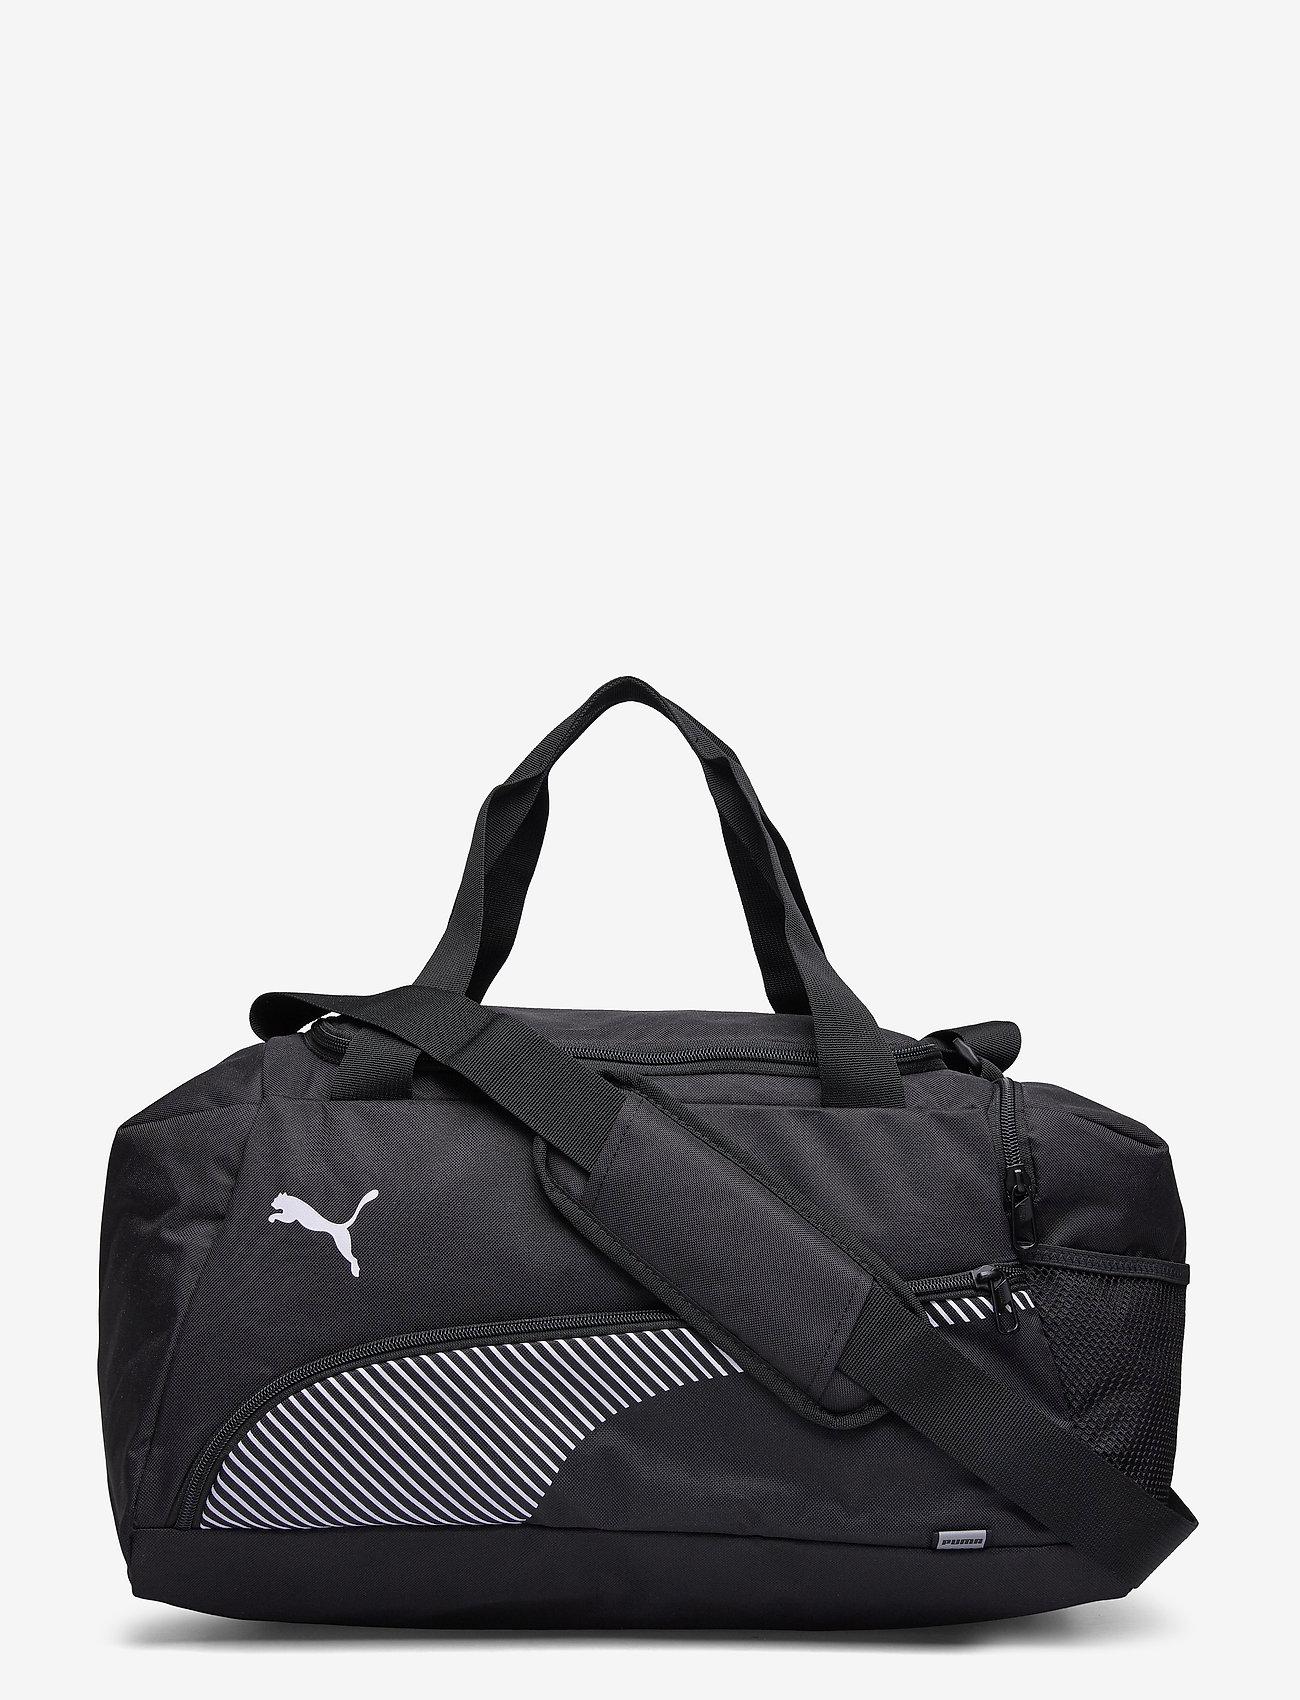 PUMA - Fundamentals Sports Bag S - trainingstaschen - puma black - 0